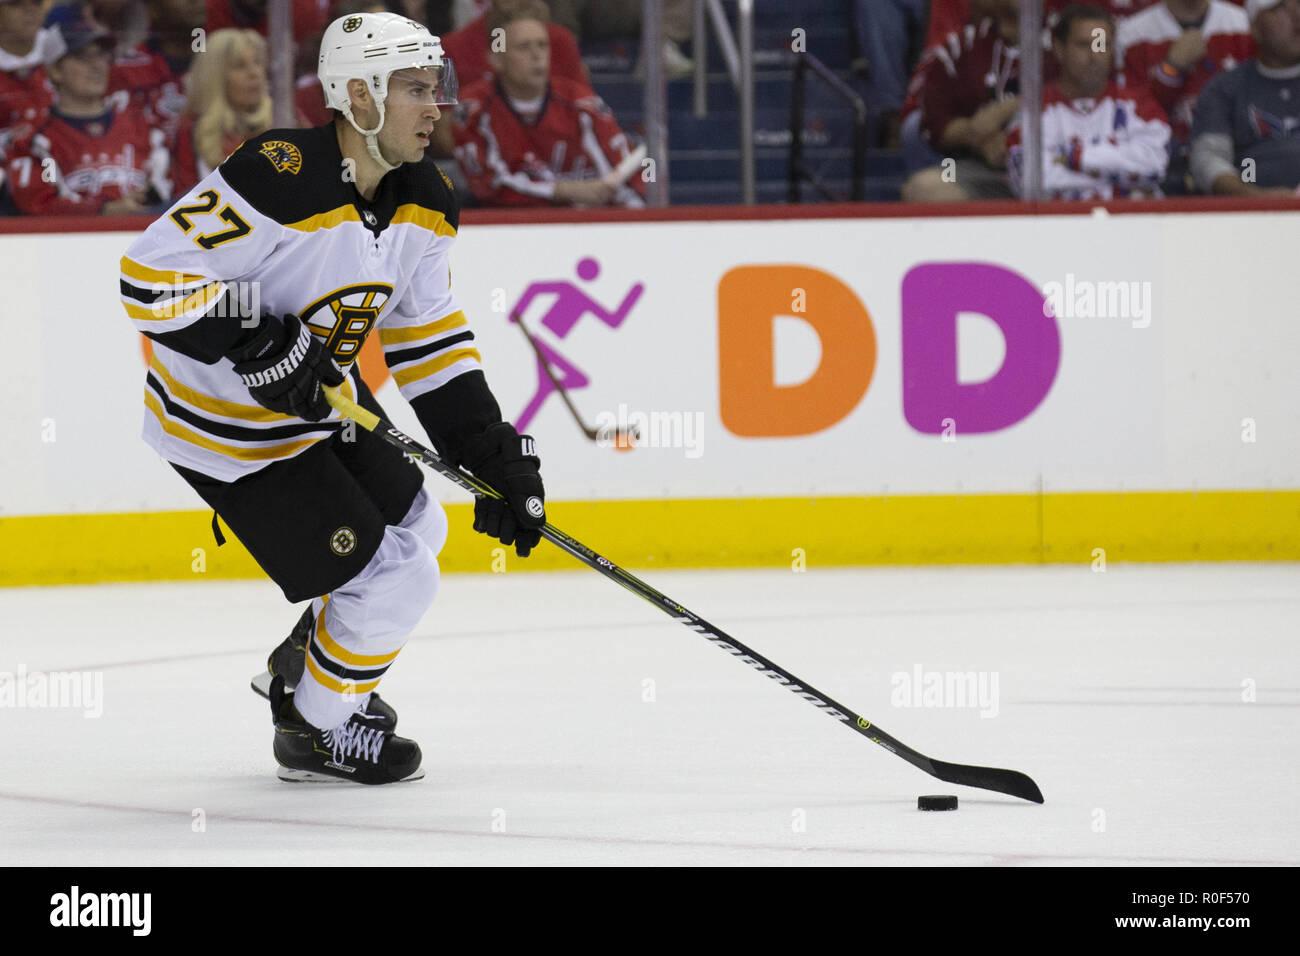 newest c5c56 67116 Washington, DC, USA. 3rd Oct, 2018. Boston Bruins defenseman ...